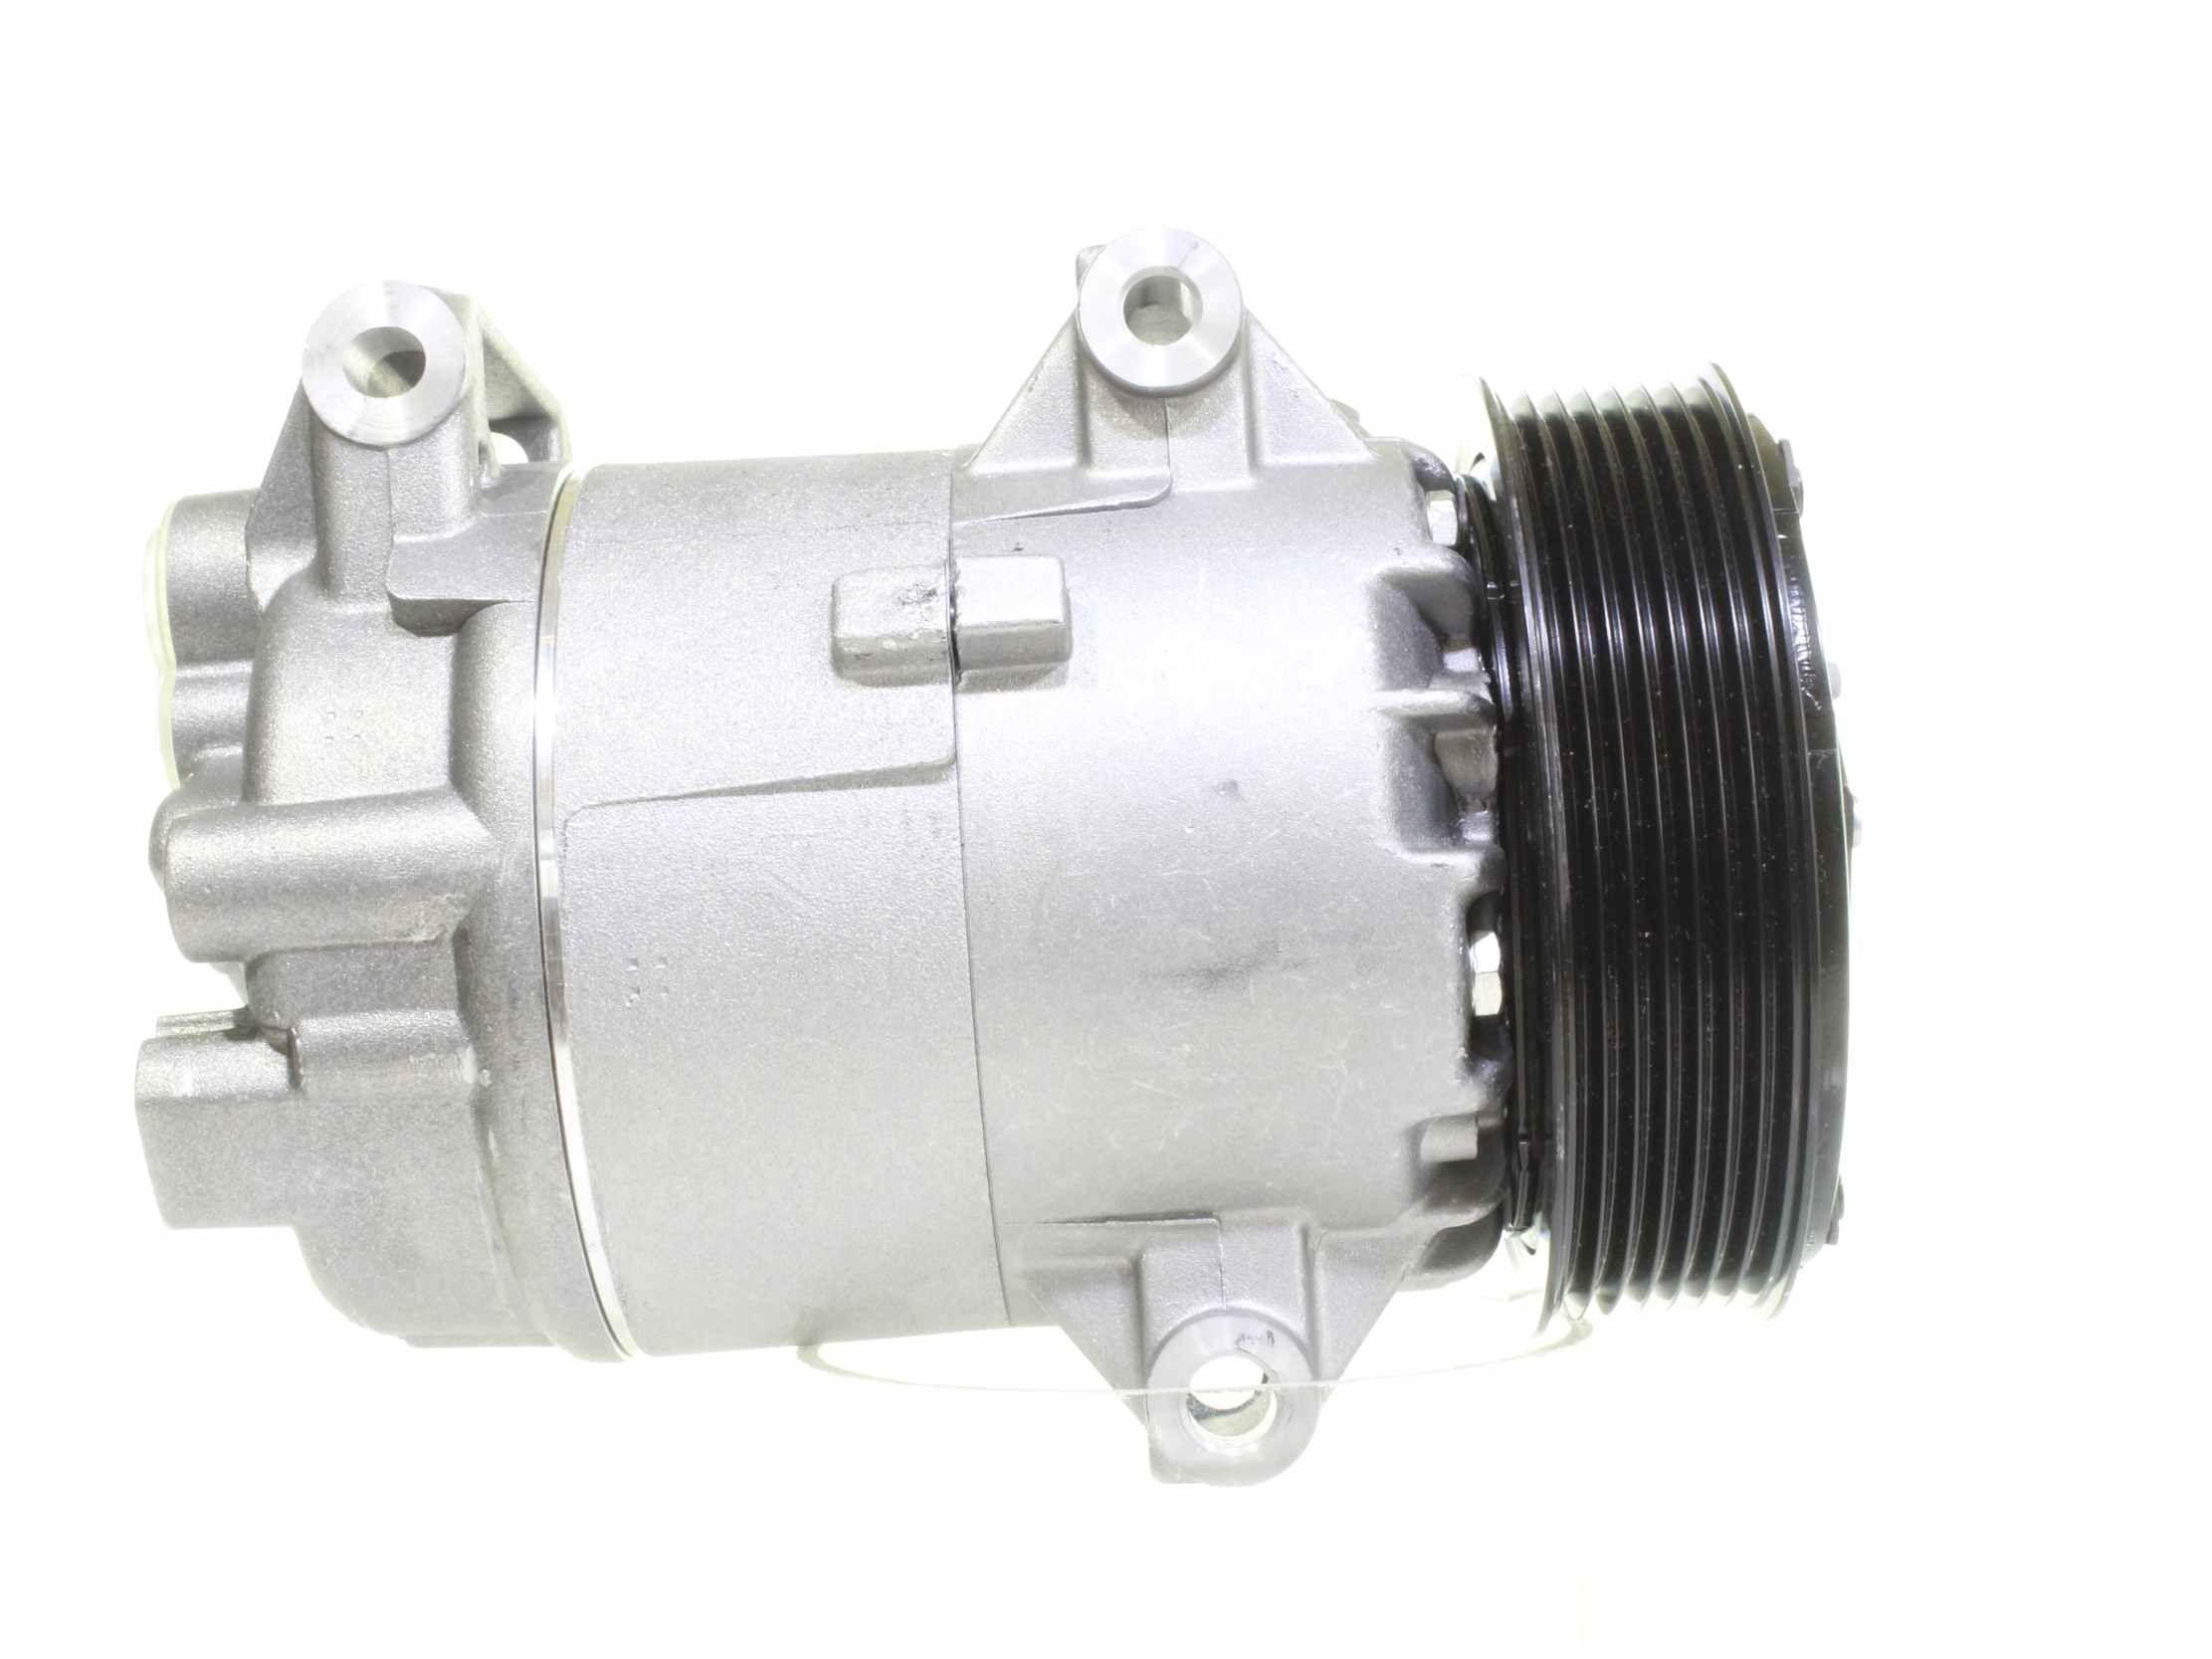 10550404 Kompressor, Klimaanlage ALANKO 550404 - Große Auswahl - stark reduziert